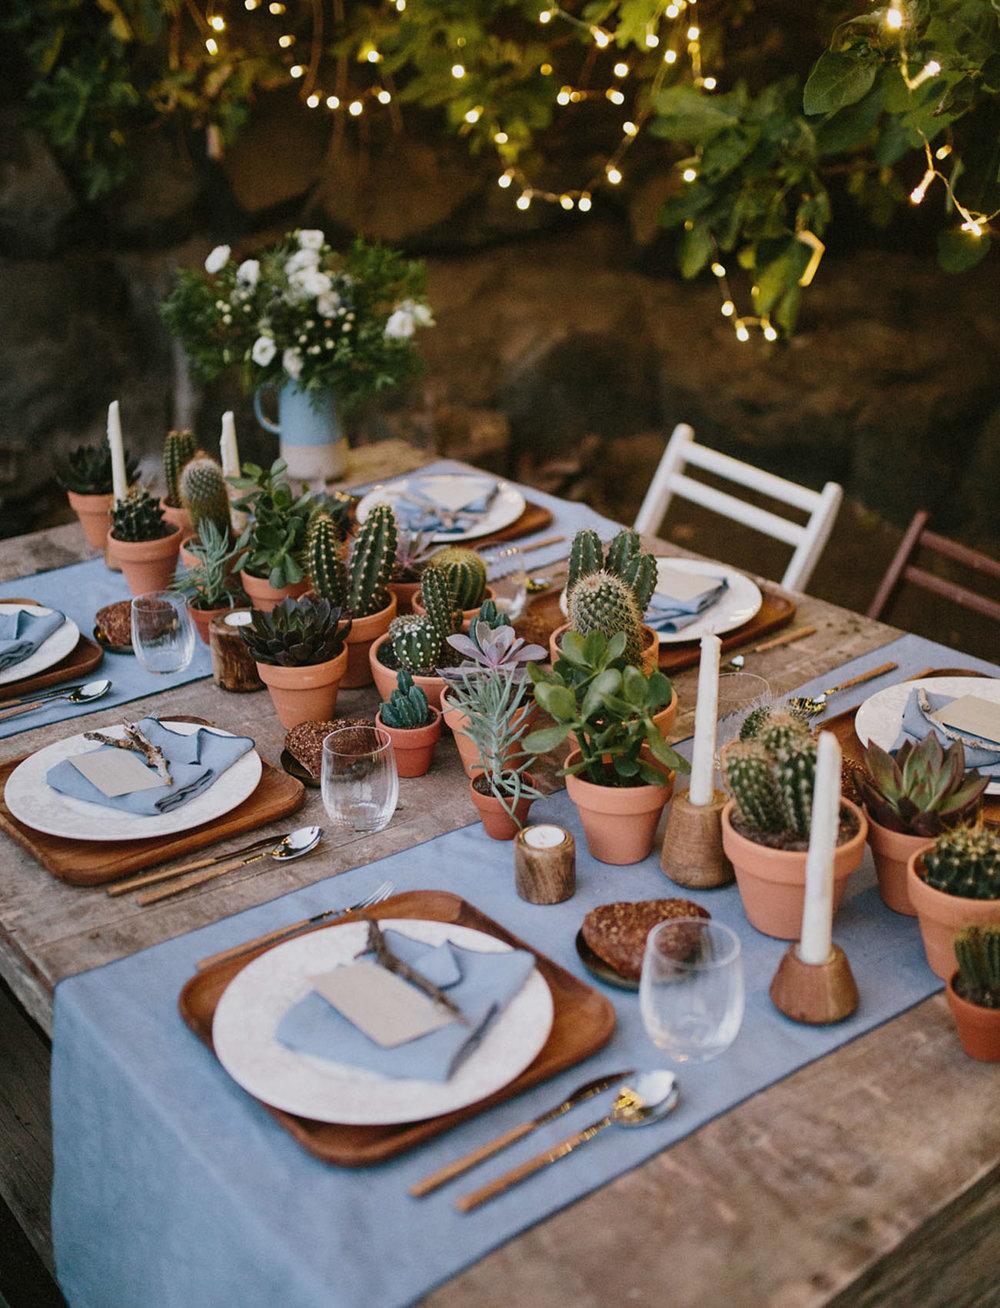 cactus-themed-wedding-ideas-centerpiece.jpg